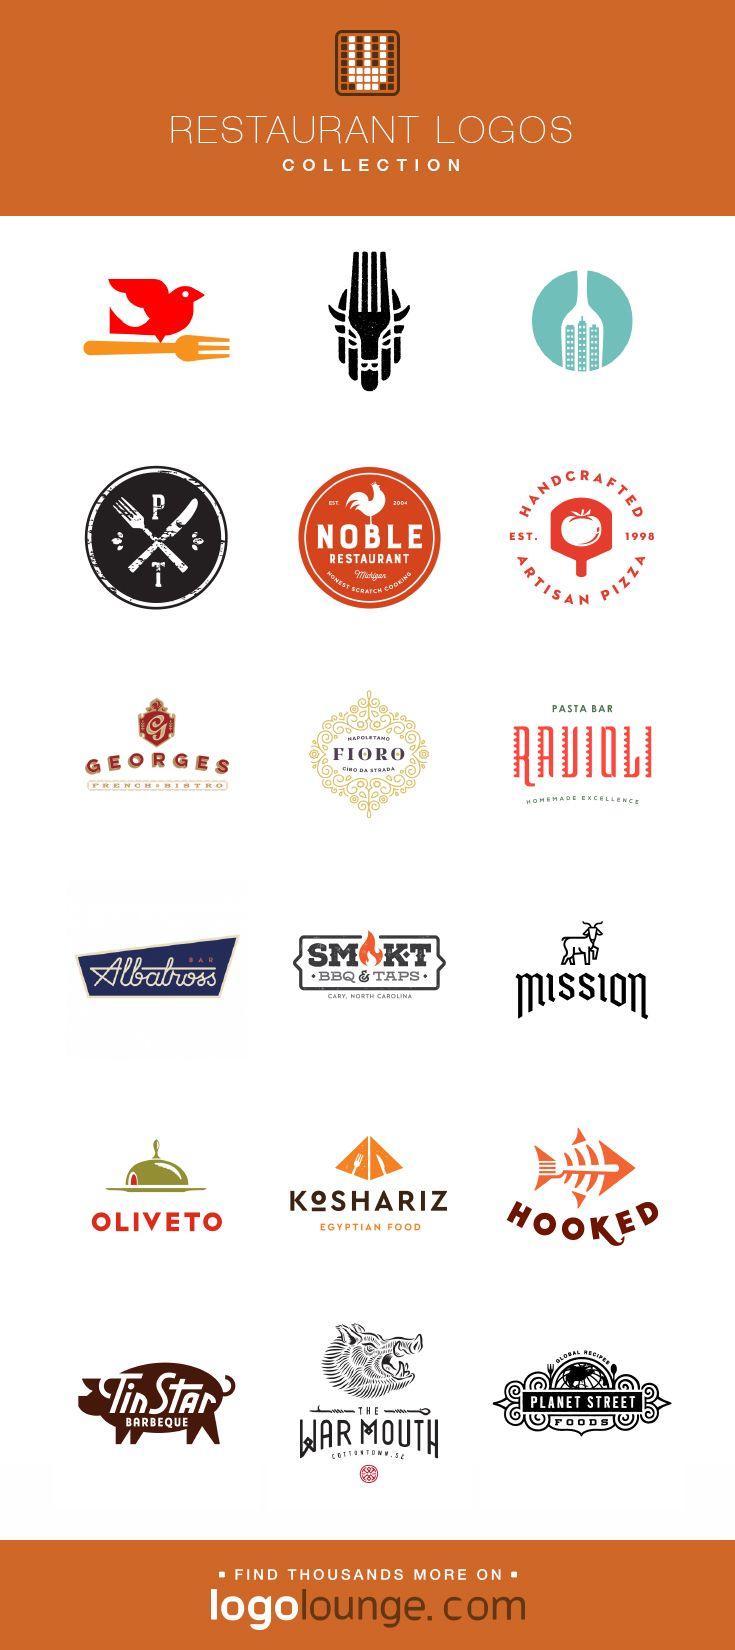 Logo Collection Restaurant Vector Logo Designs Utensils Fork